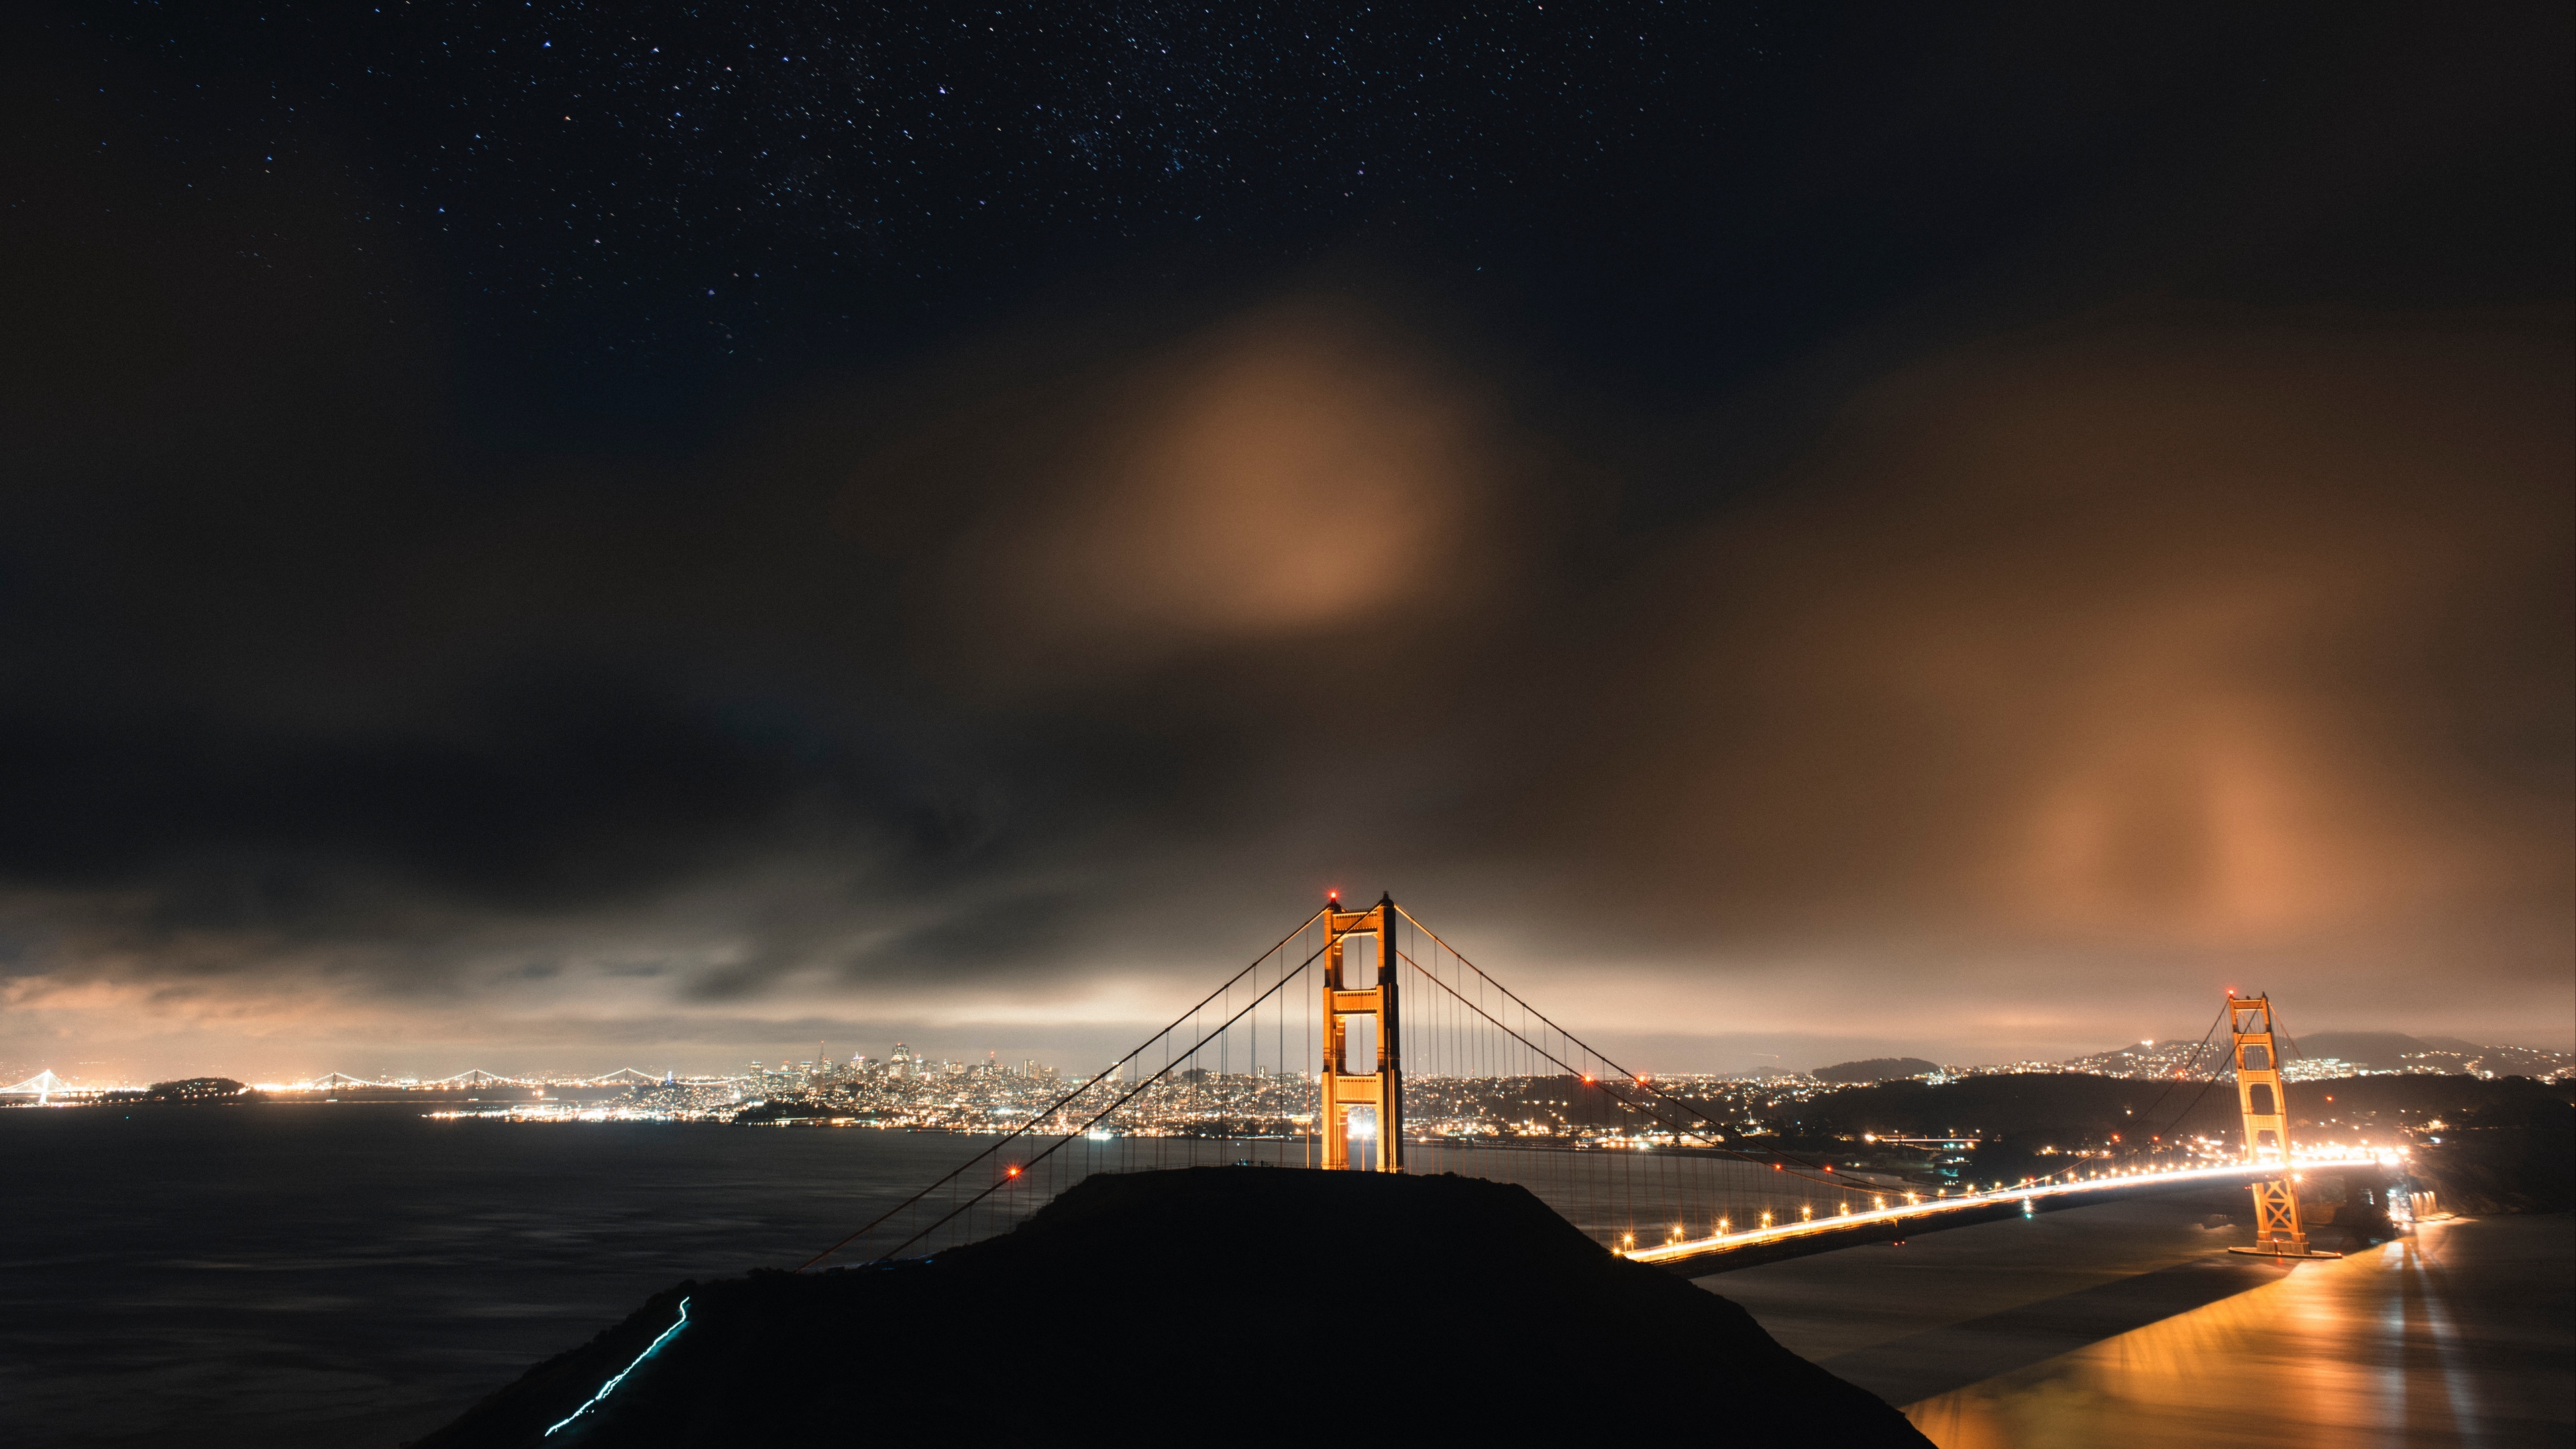 bridge starry sky night city clouds san francisco usa 4k 1541115465 - bridge, starry sky, night city, clouds, san francisco, usa 4k - starry sky, night city, bridge